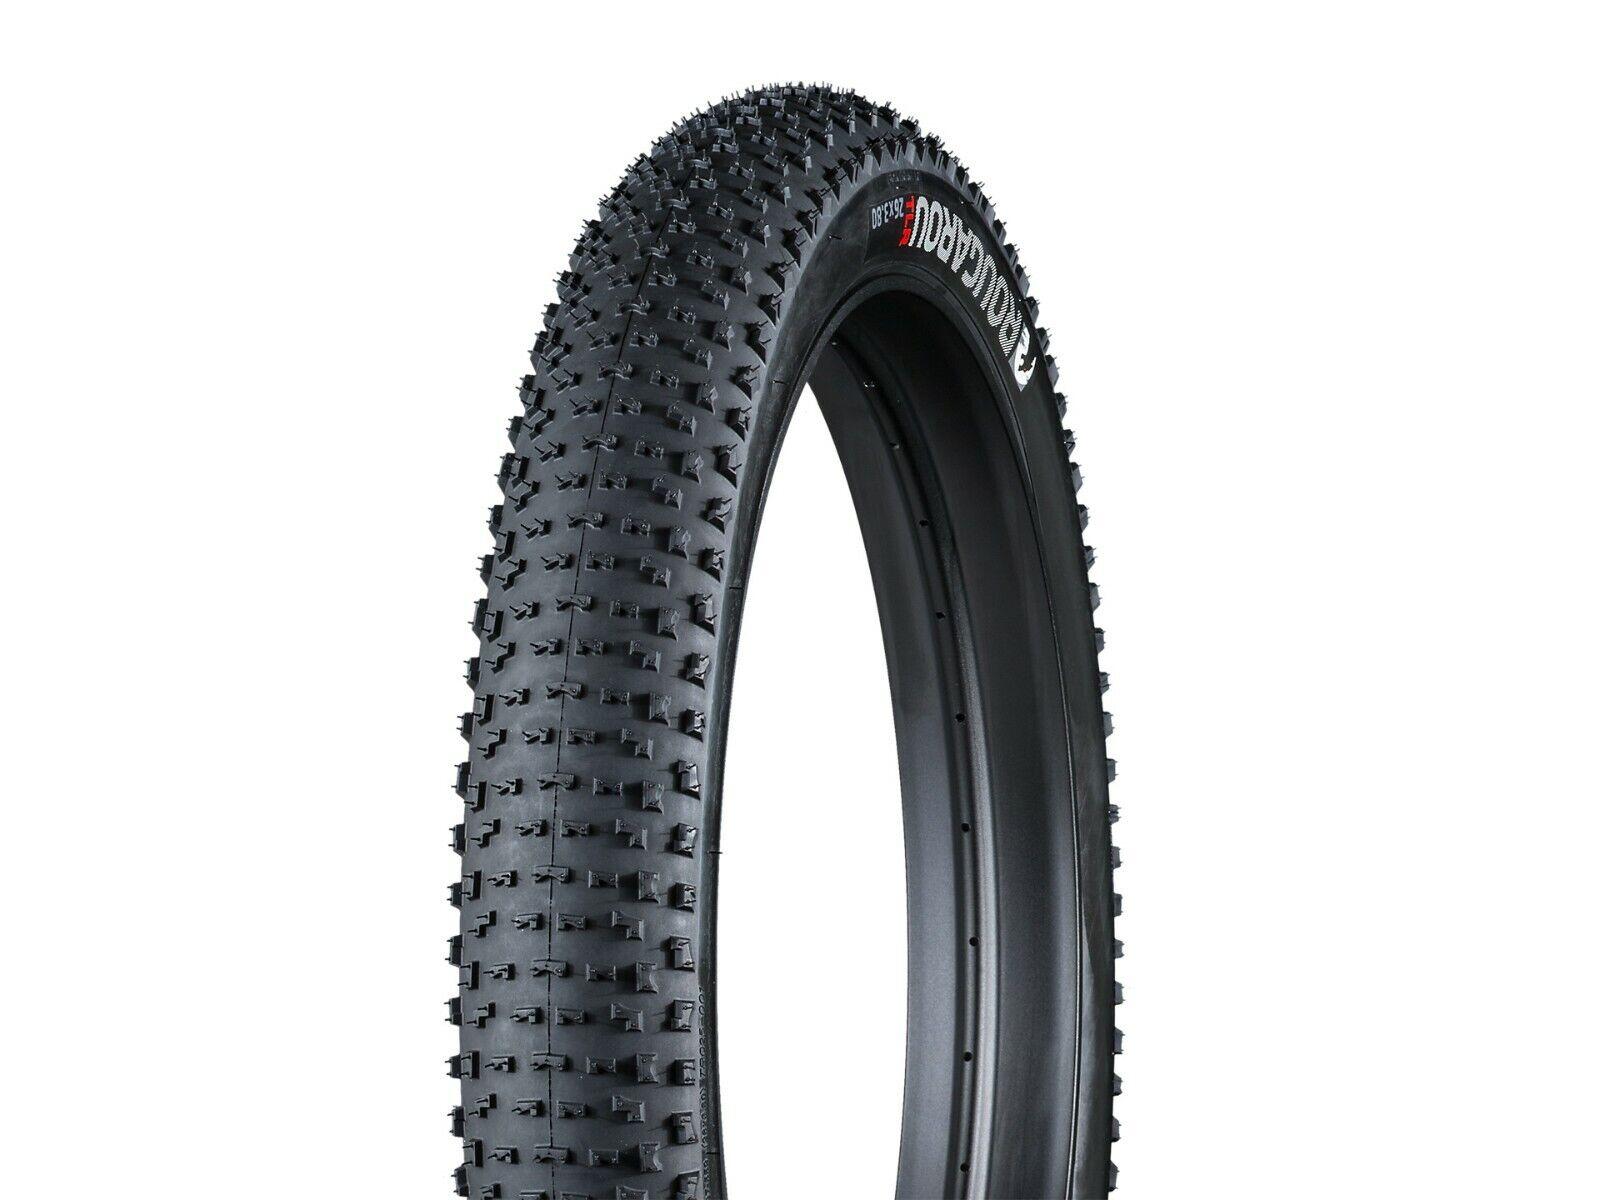 Bontrager Rougarou Fat Bike Tire 26 X 3.8 TLR Tubeless 60 tpi MTB 513949 New